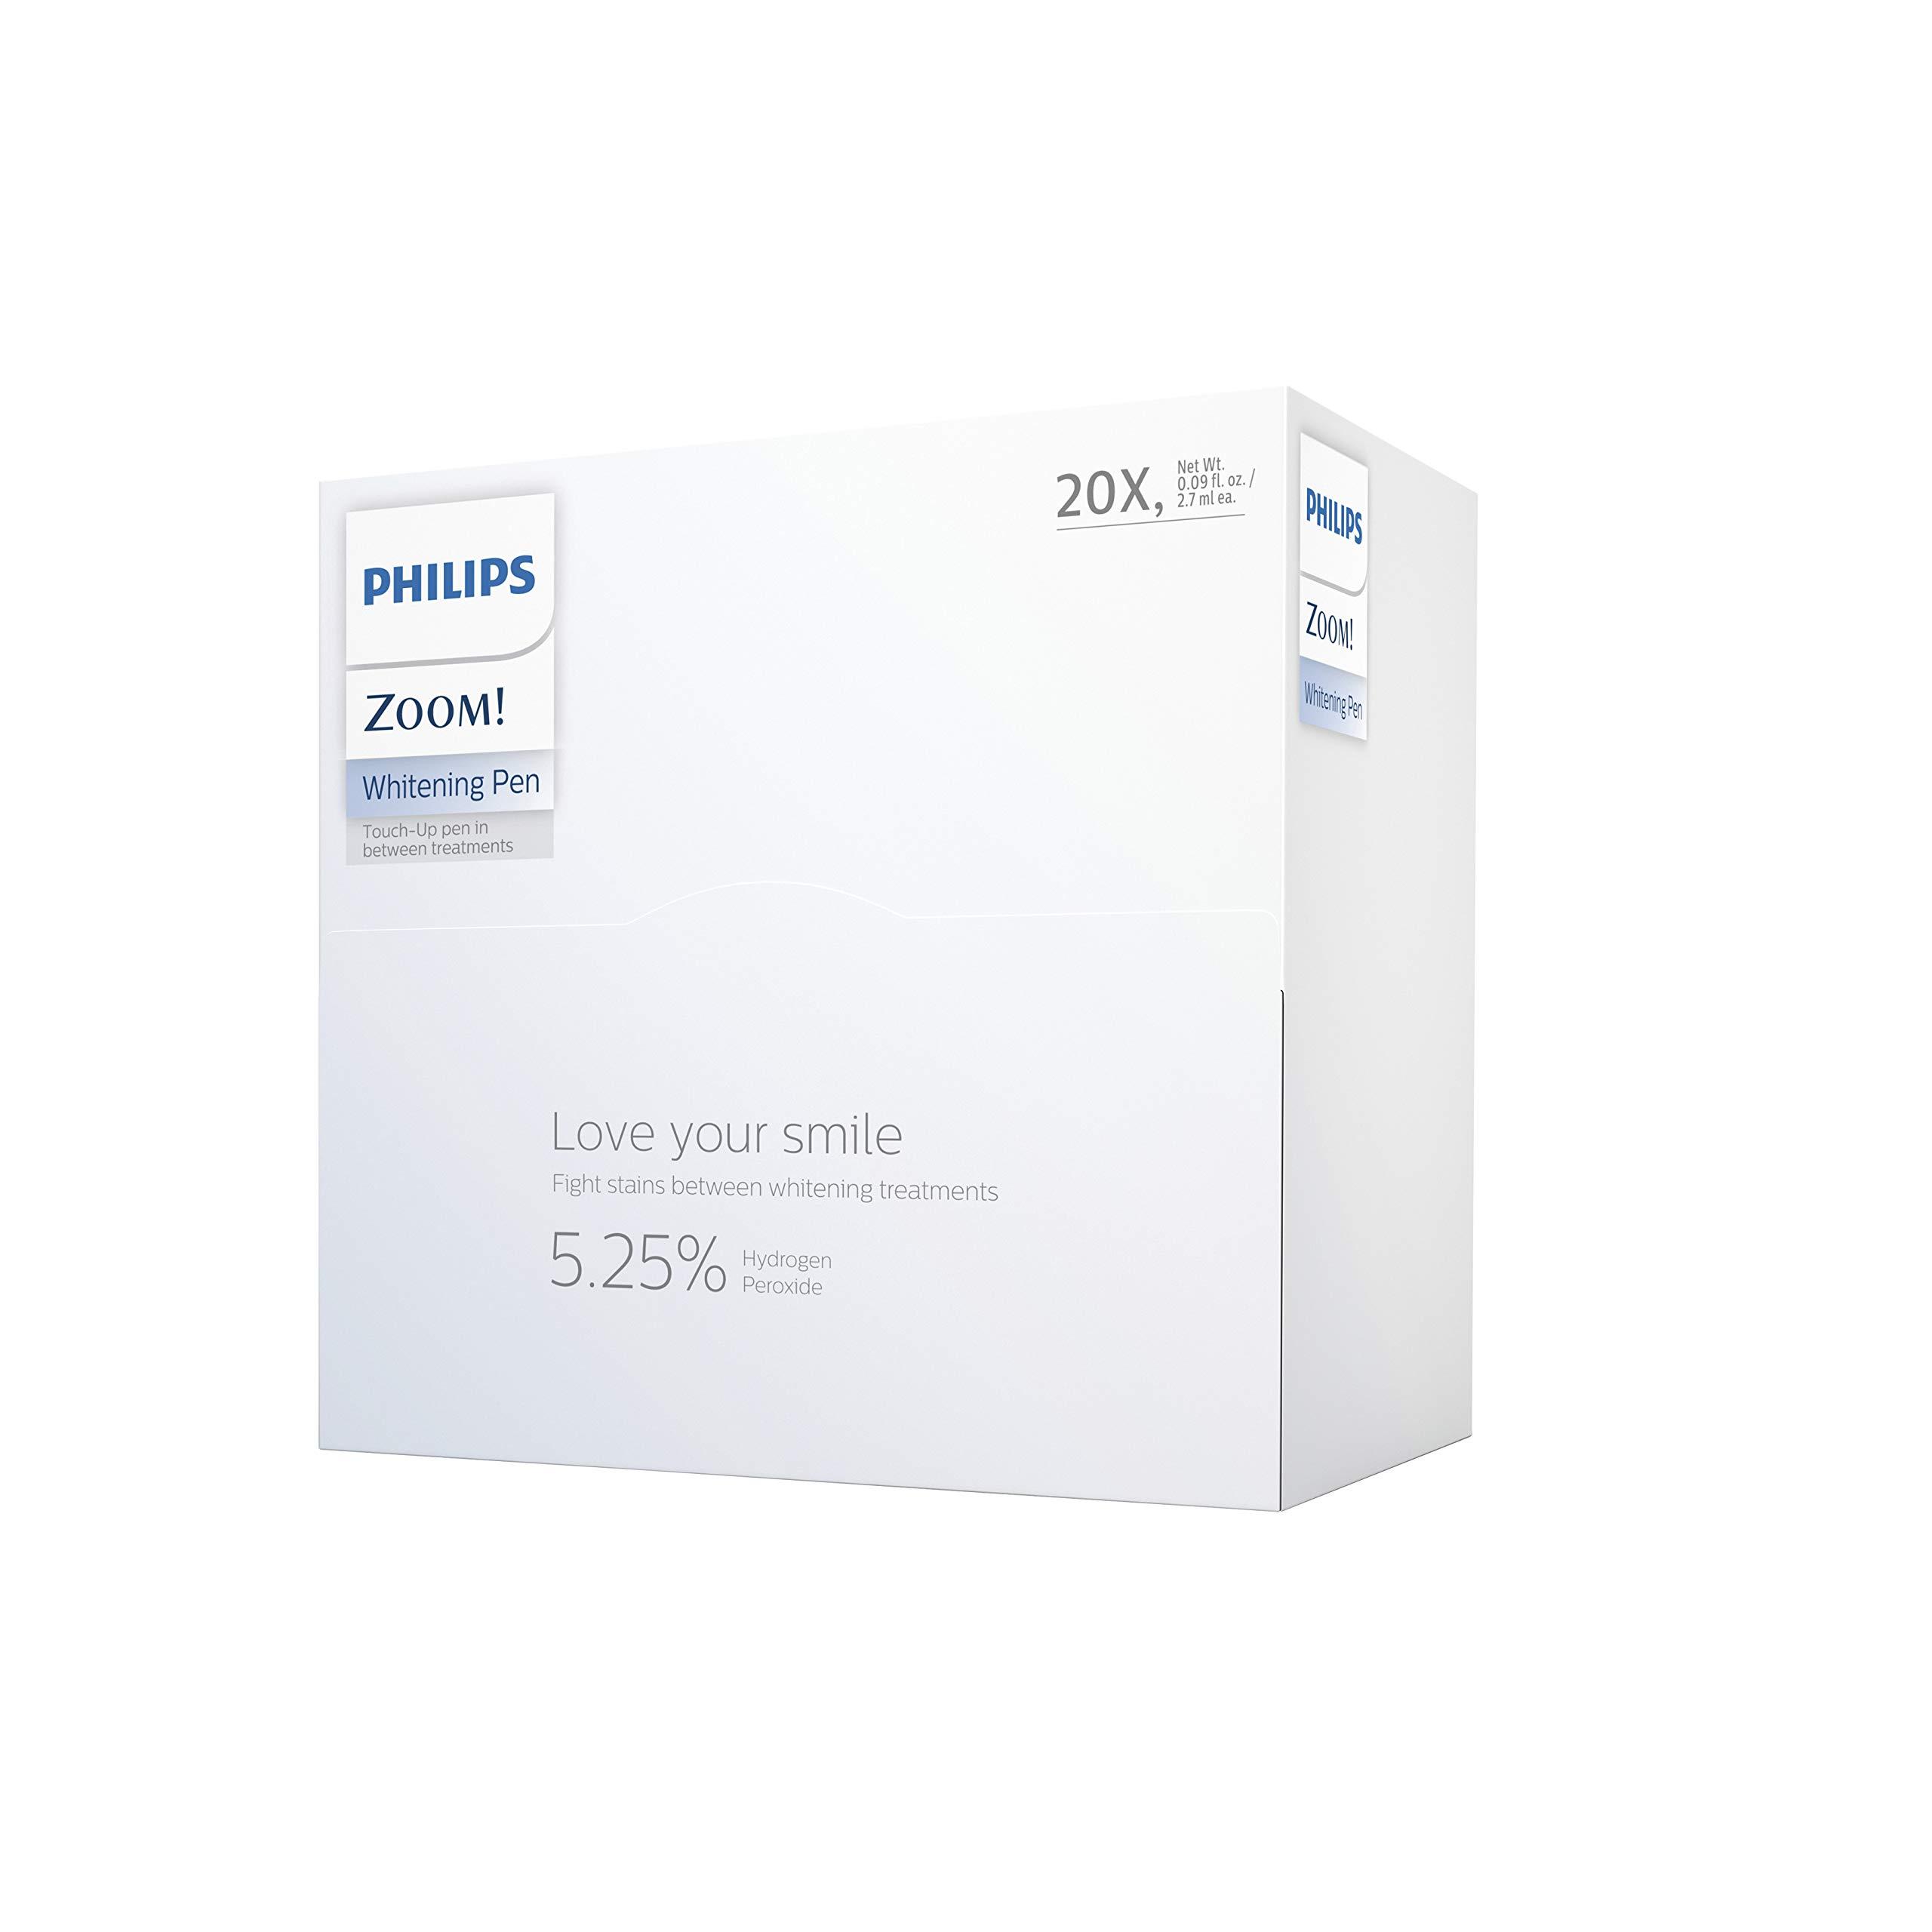 Philips Zoom Whitening Pens 5.25% HP Bulk Pack (20 Pen) by Philips Zoom